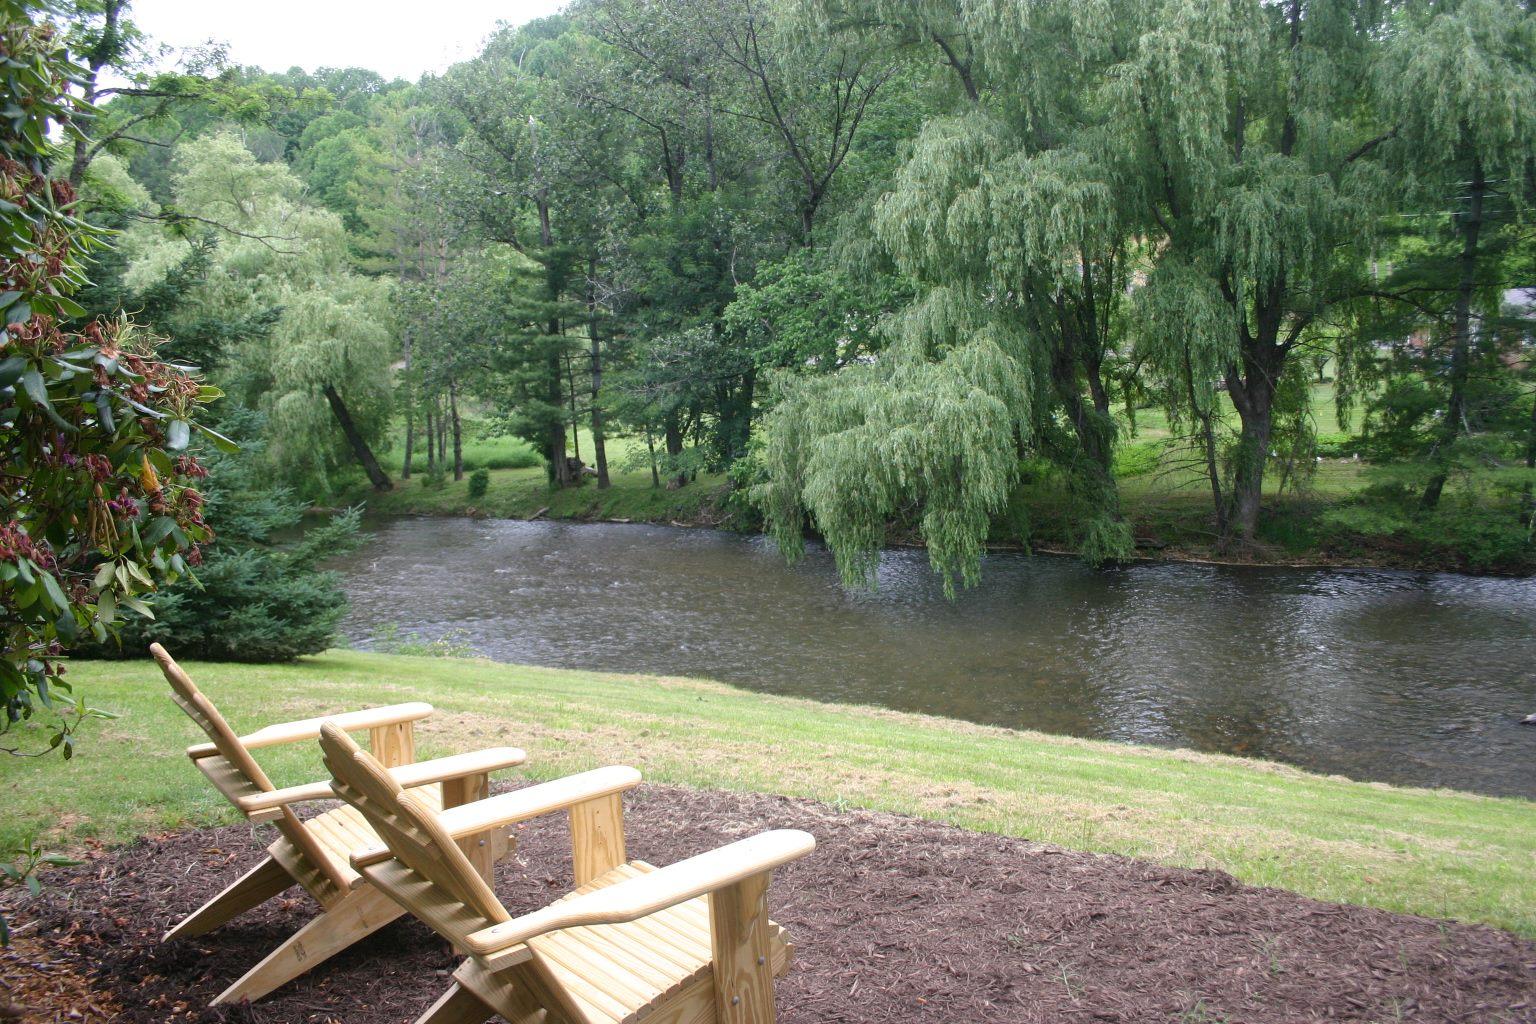 Carolina Mountain Properties Rentals Ashe County New River Waters Edge Property Trout Fishing